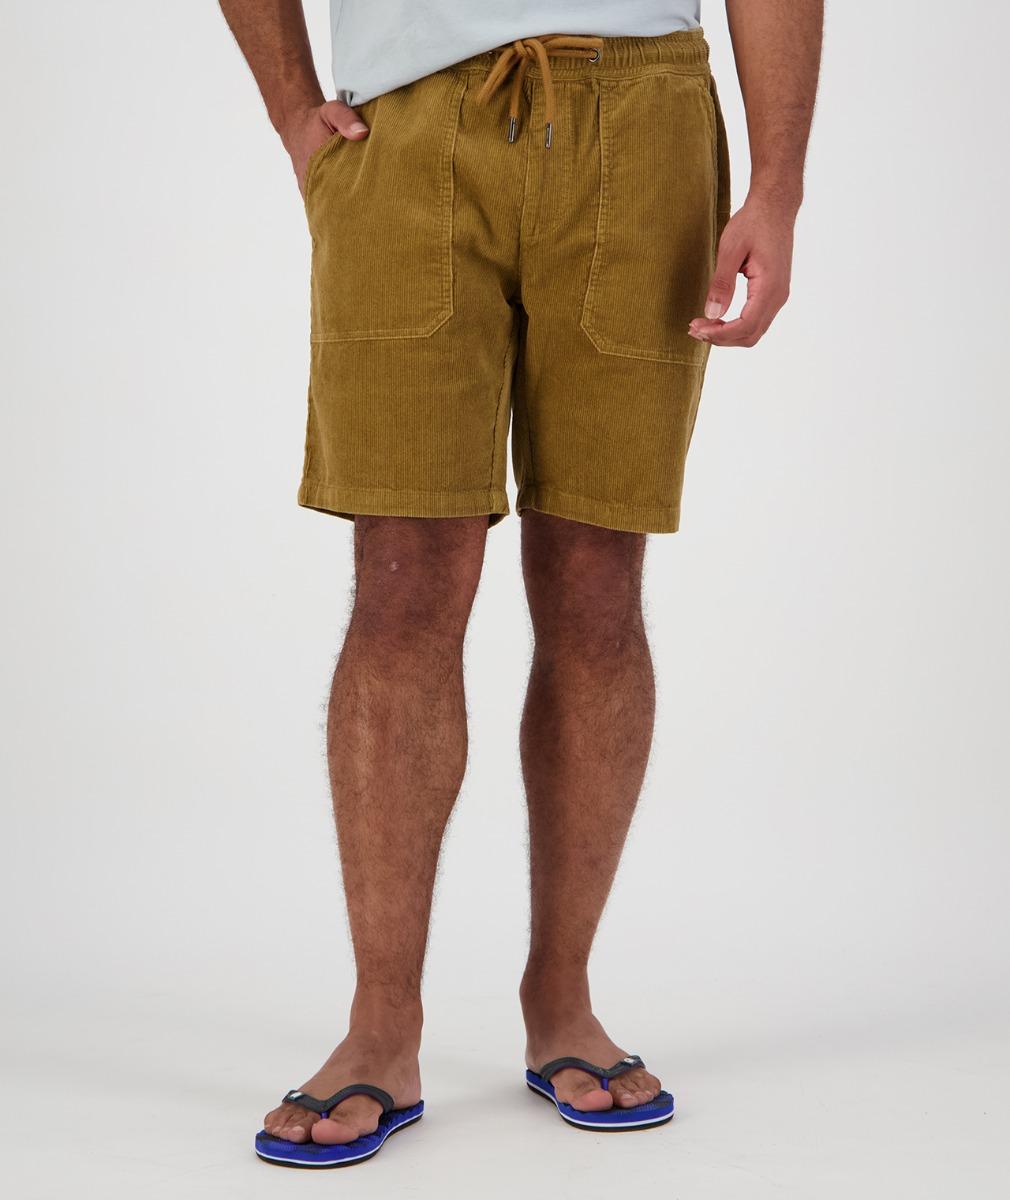 Swanndri Men's Long Bay V2 Cord Shorts in Taupe